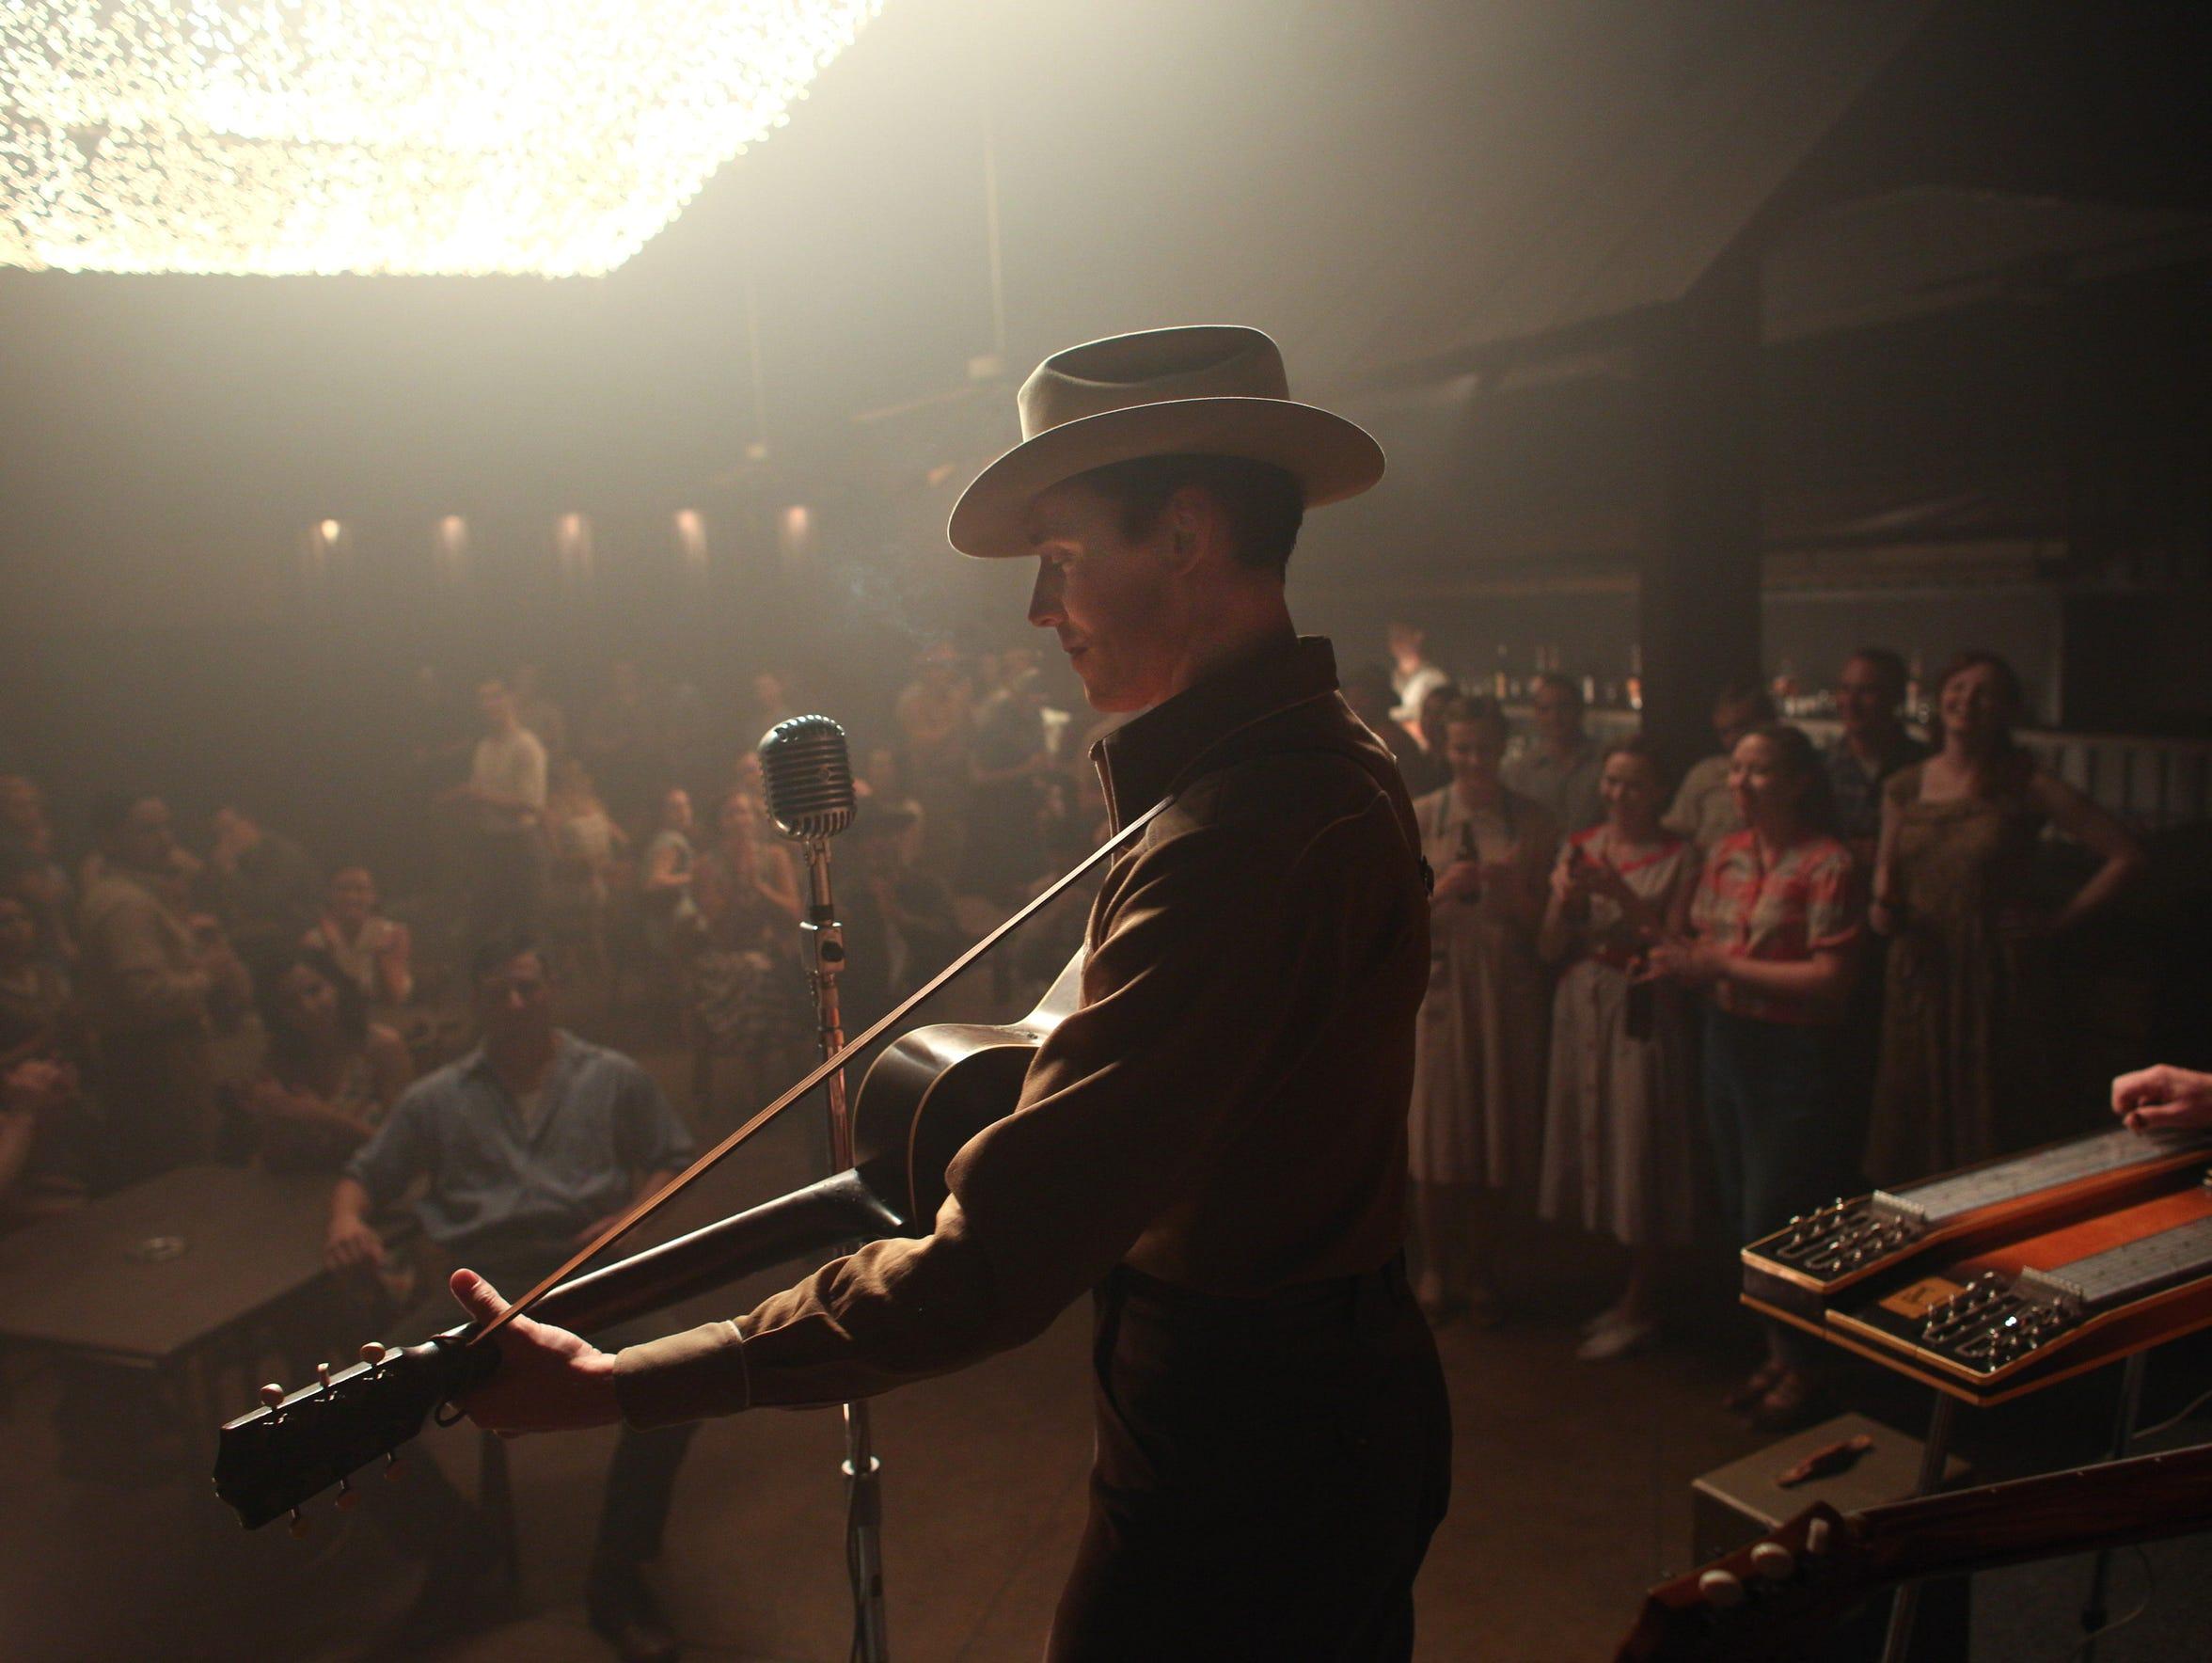 Tom Hiddleston as Hank Williams. The scene was filmed